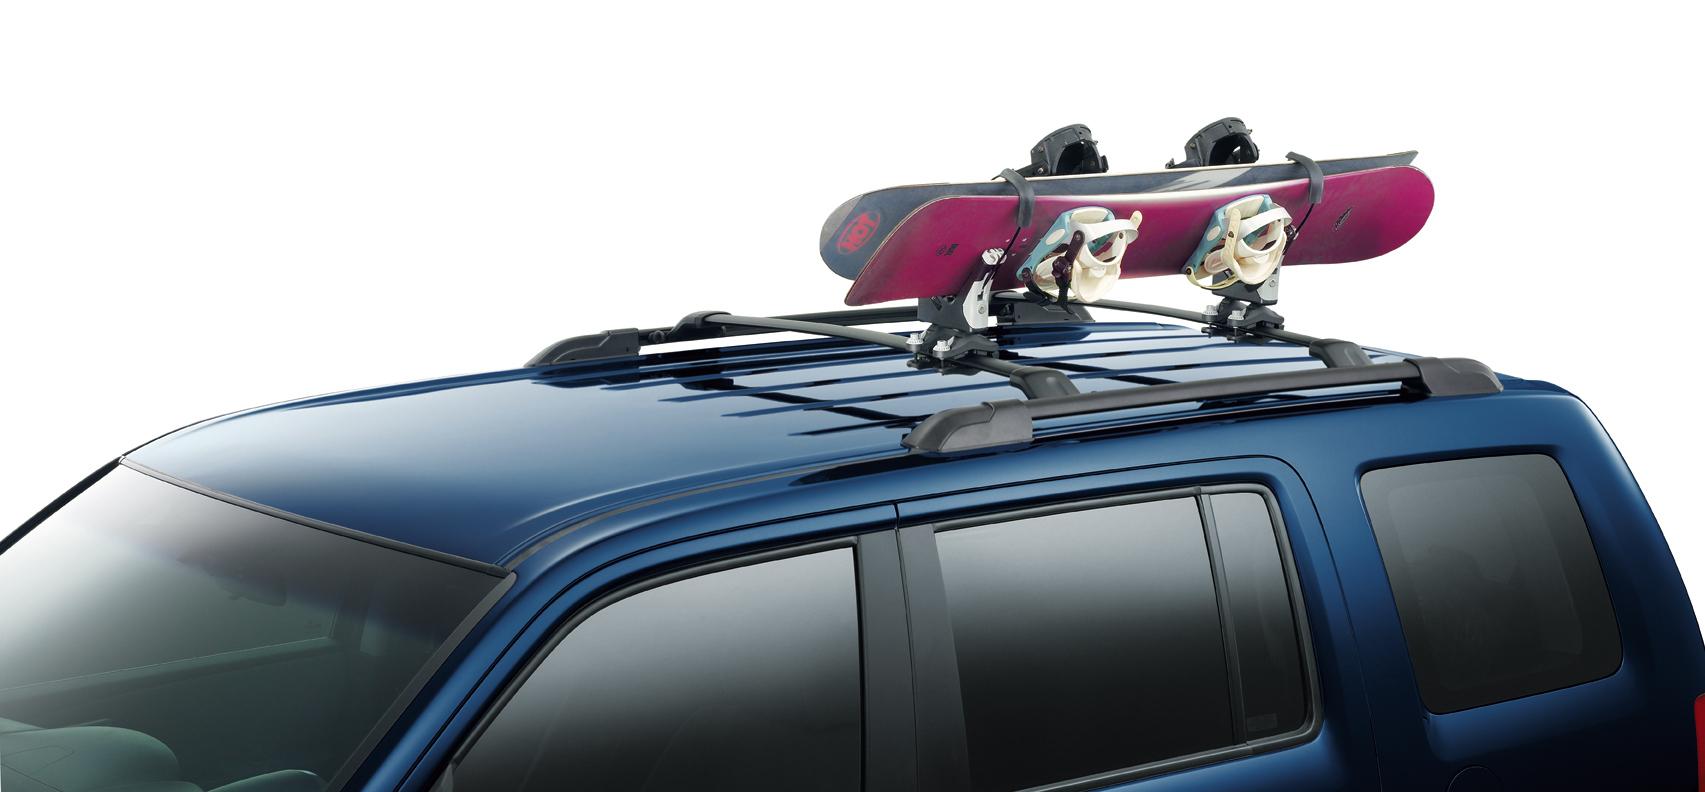 Snowboard Attachment Roof Rack Pilot 116 62